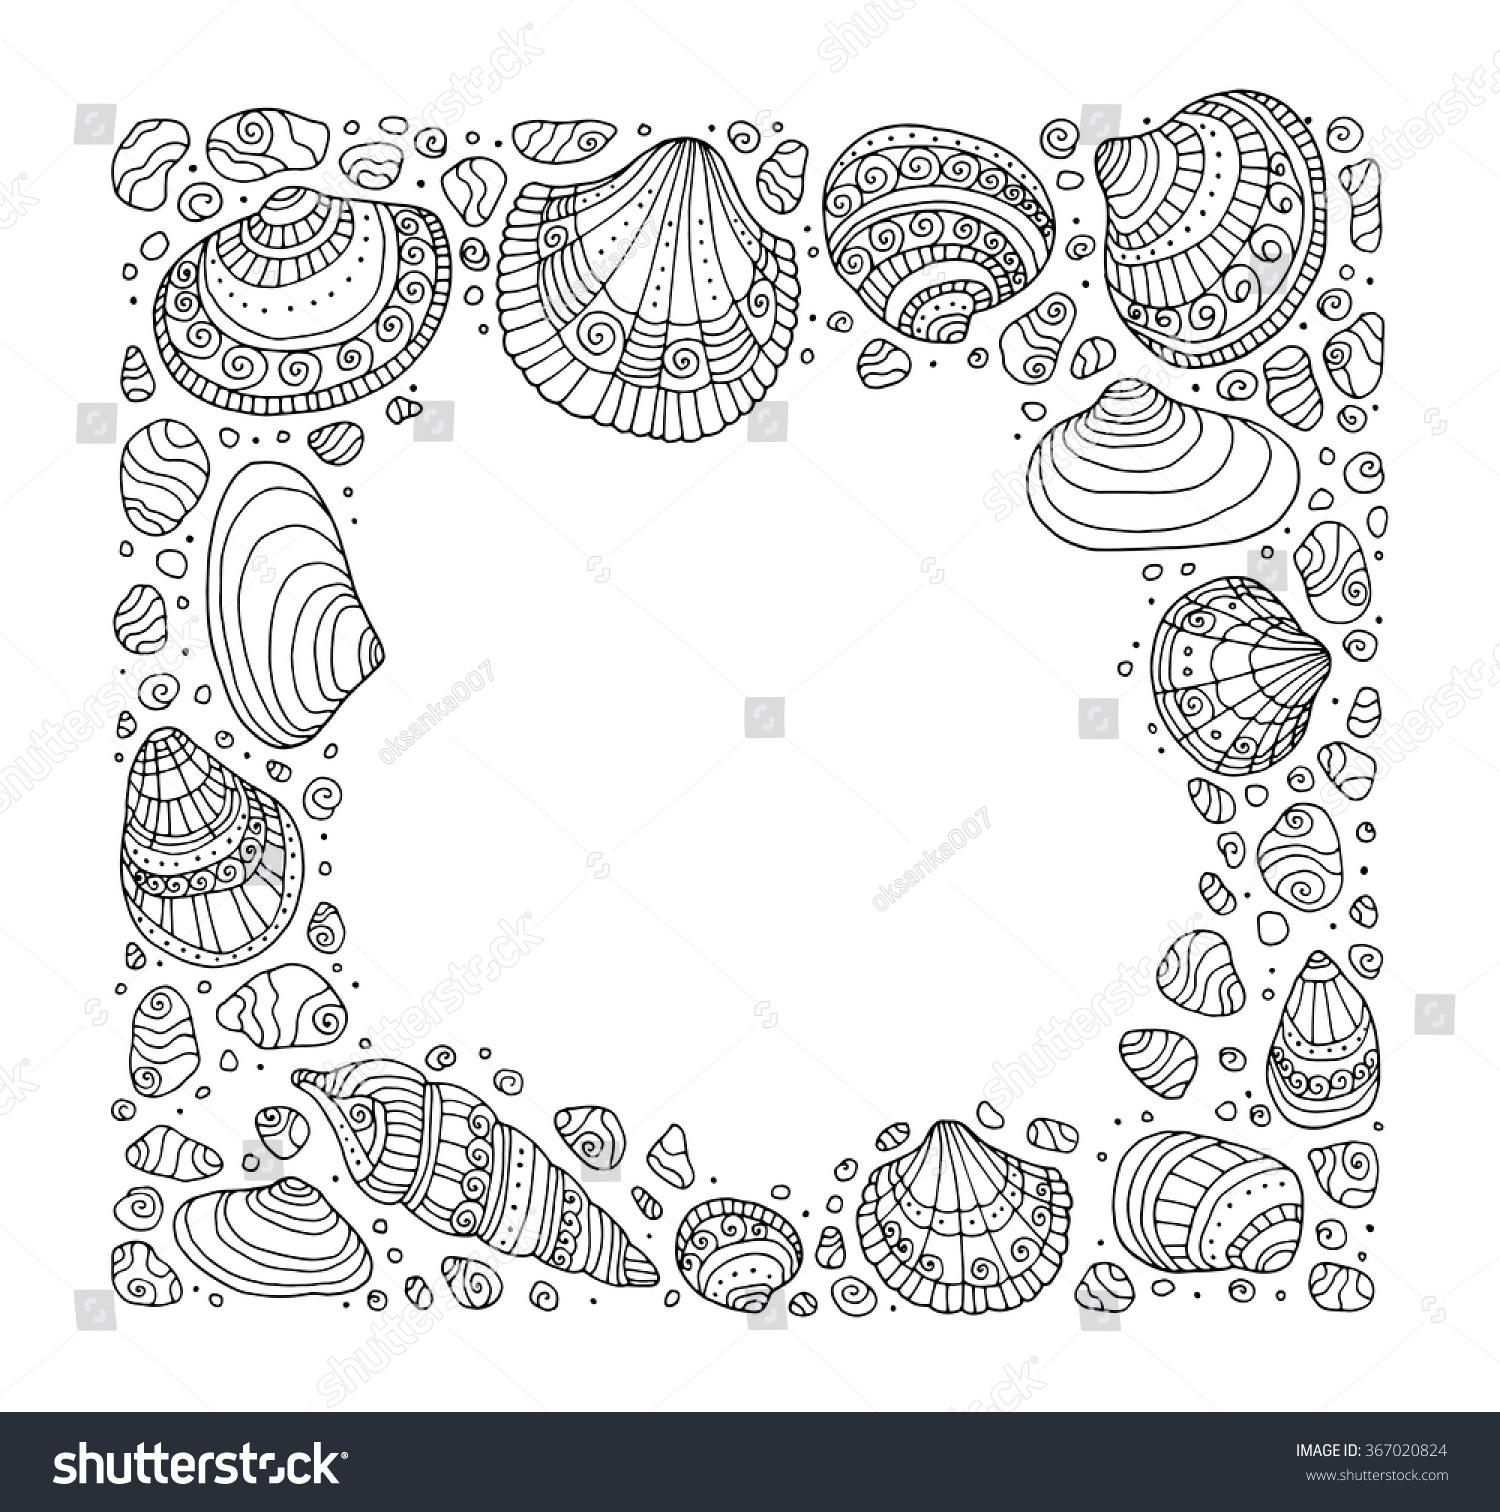 Zen ocean colouring book - Seashell Border Frame Ocean Pattern Vector Vintage Illustration Zentangle Coloring Book Page